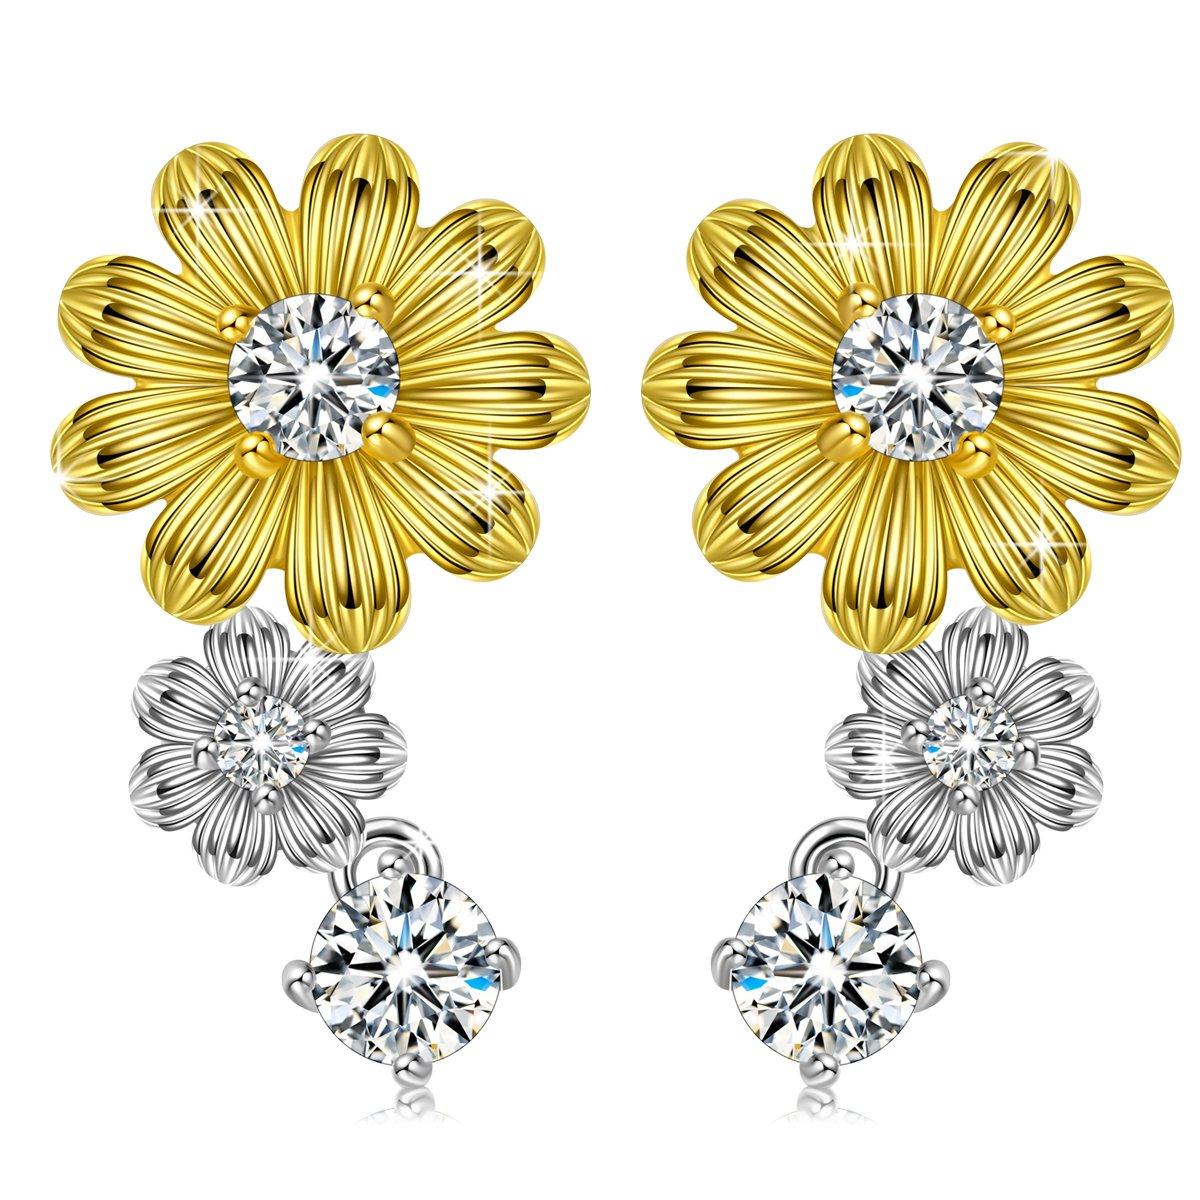 Women Jewelry Anniversary Gift for Her Birthday Gift for Wife Sunflower Stud Earrings for Women Sterling Silver No Sensitive Earrings for Sister Daughter